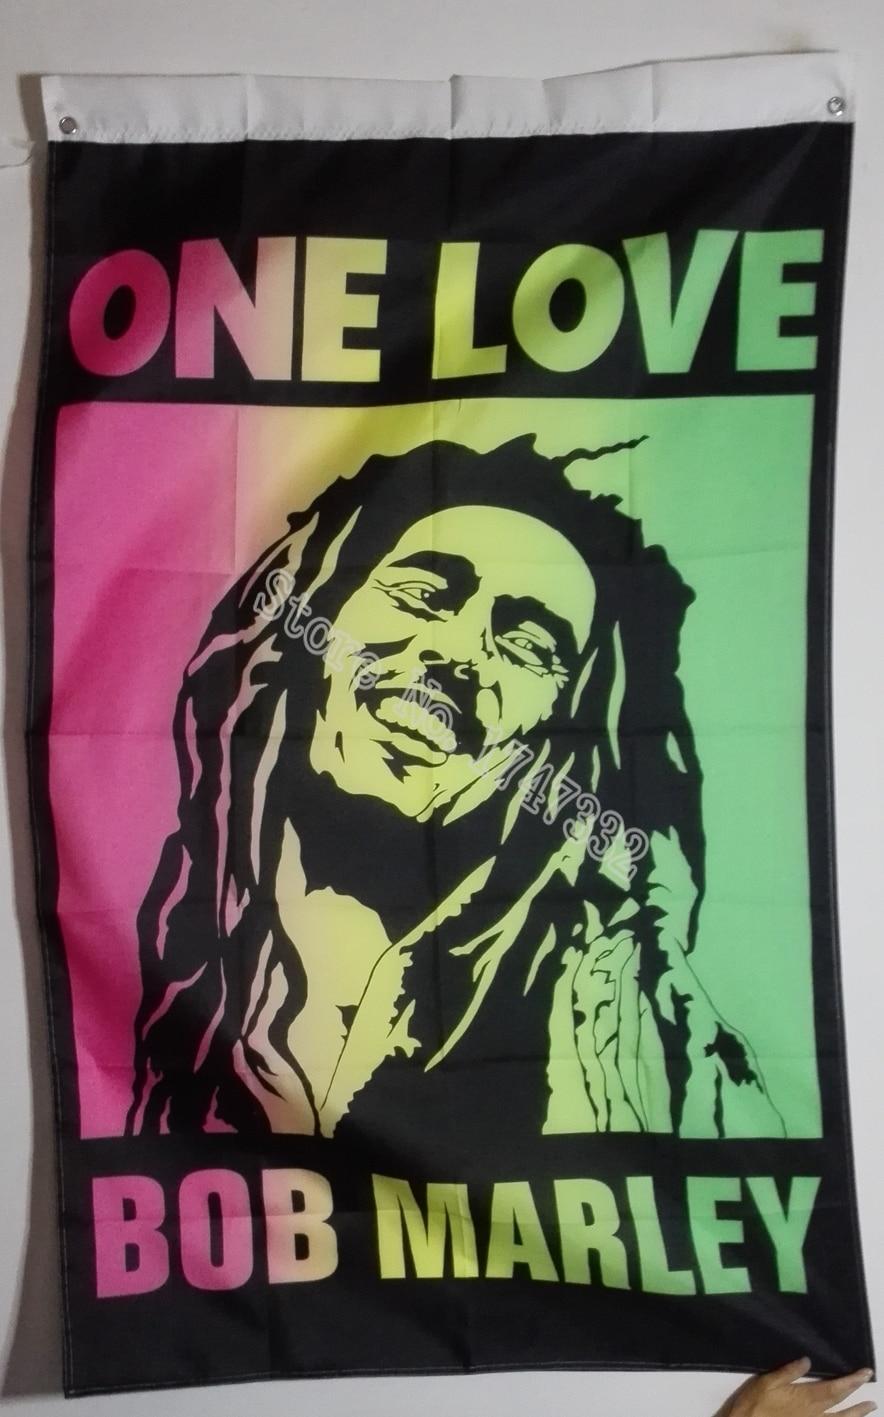 Bob Marley One Love Jamajka Rasta Flag hot prodat zboží 3X5FT 150X90CM Banner mosaz kovové otvory